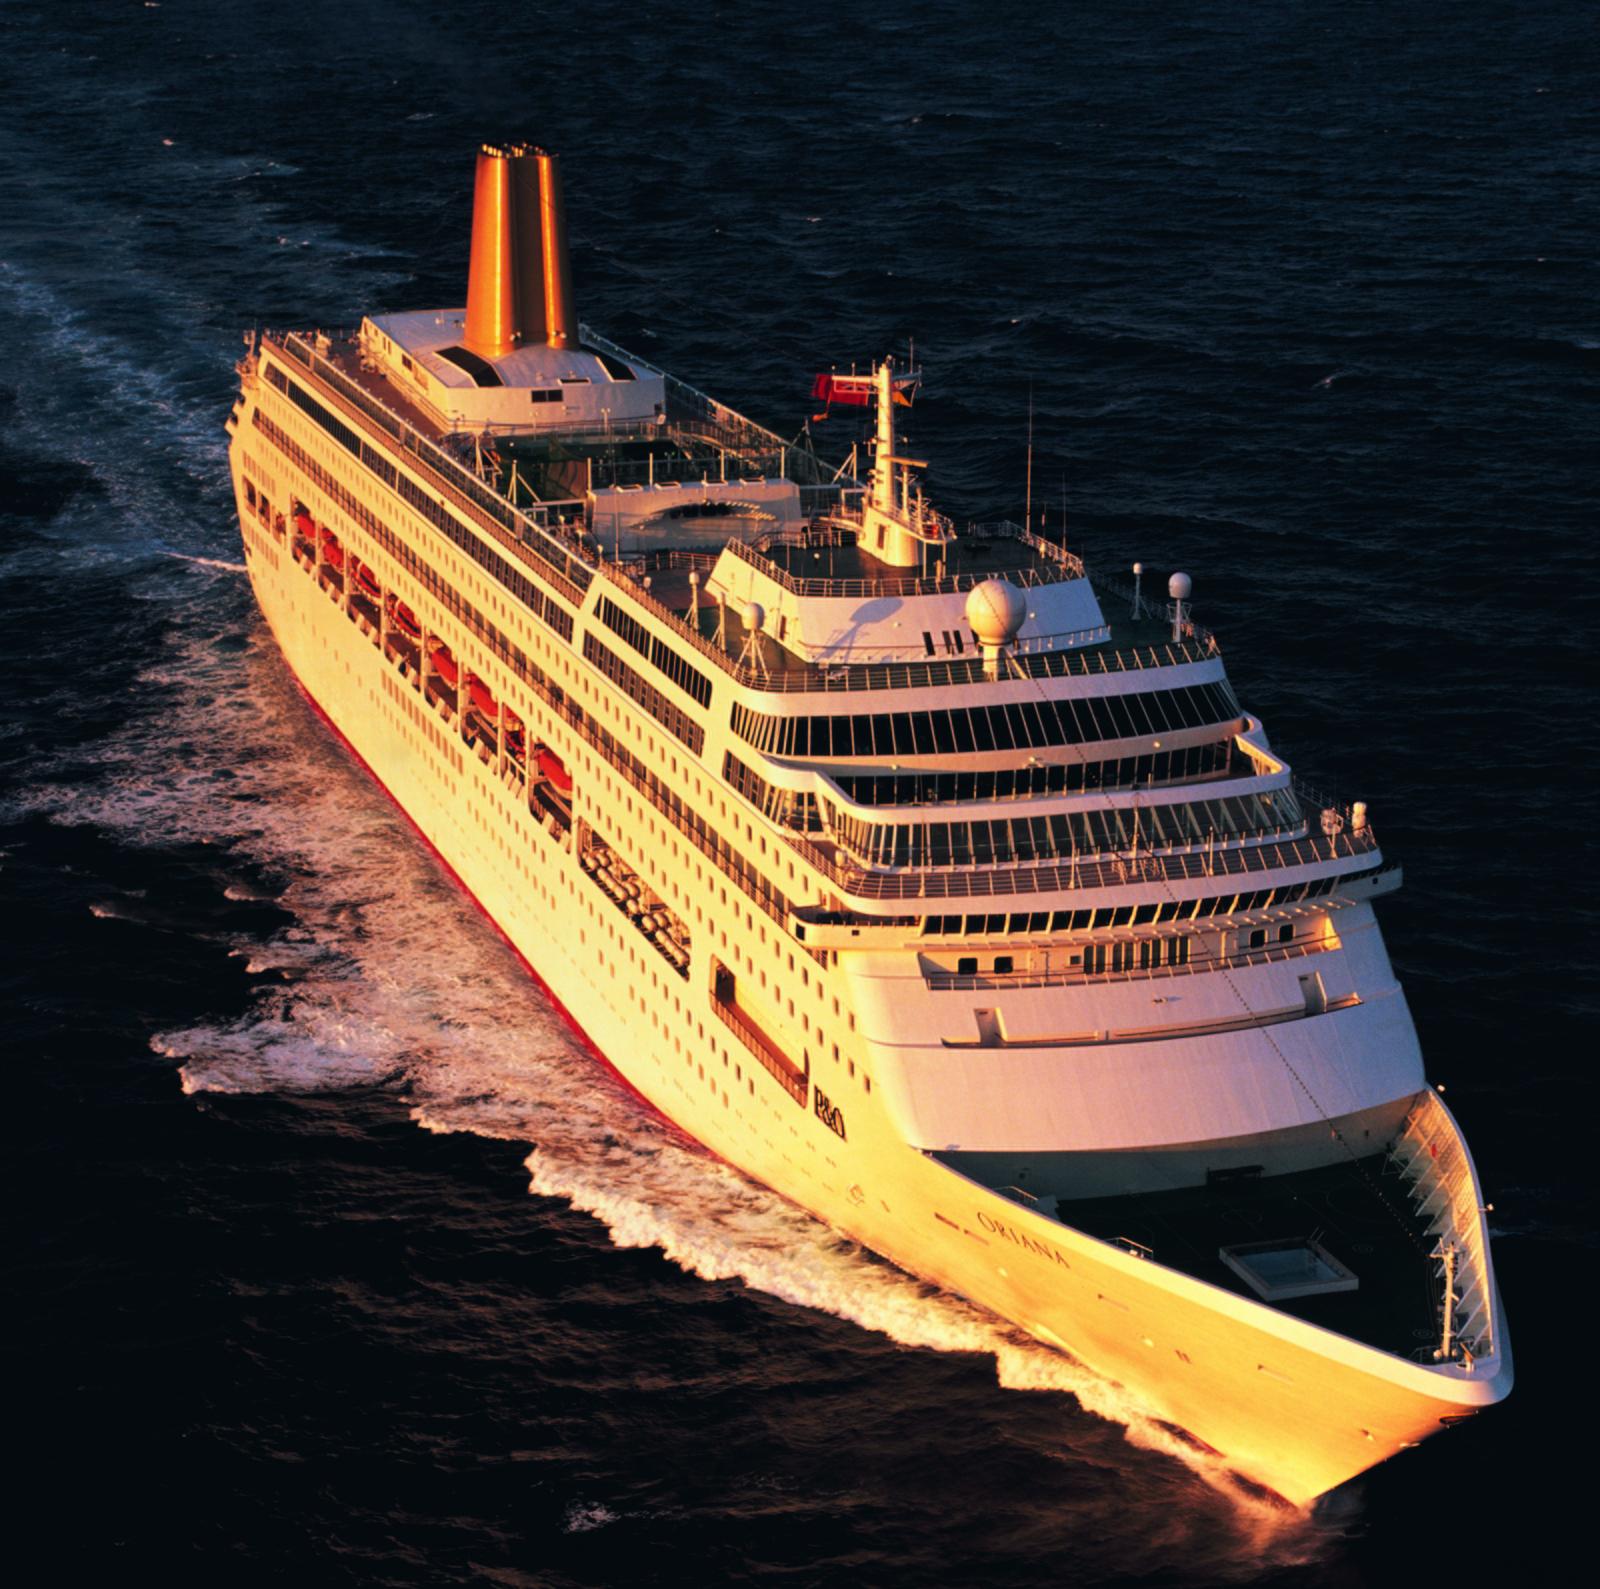 P&O Cruises Oriana cruise ship in Lisbon - YouTube